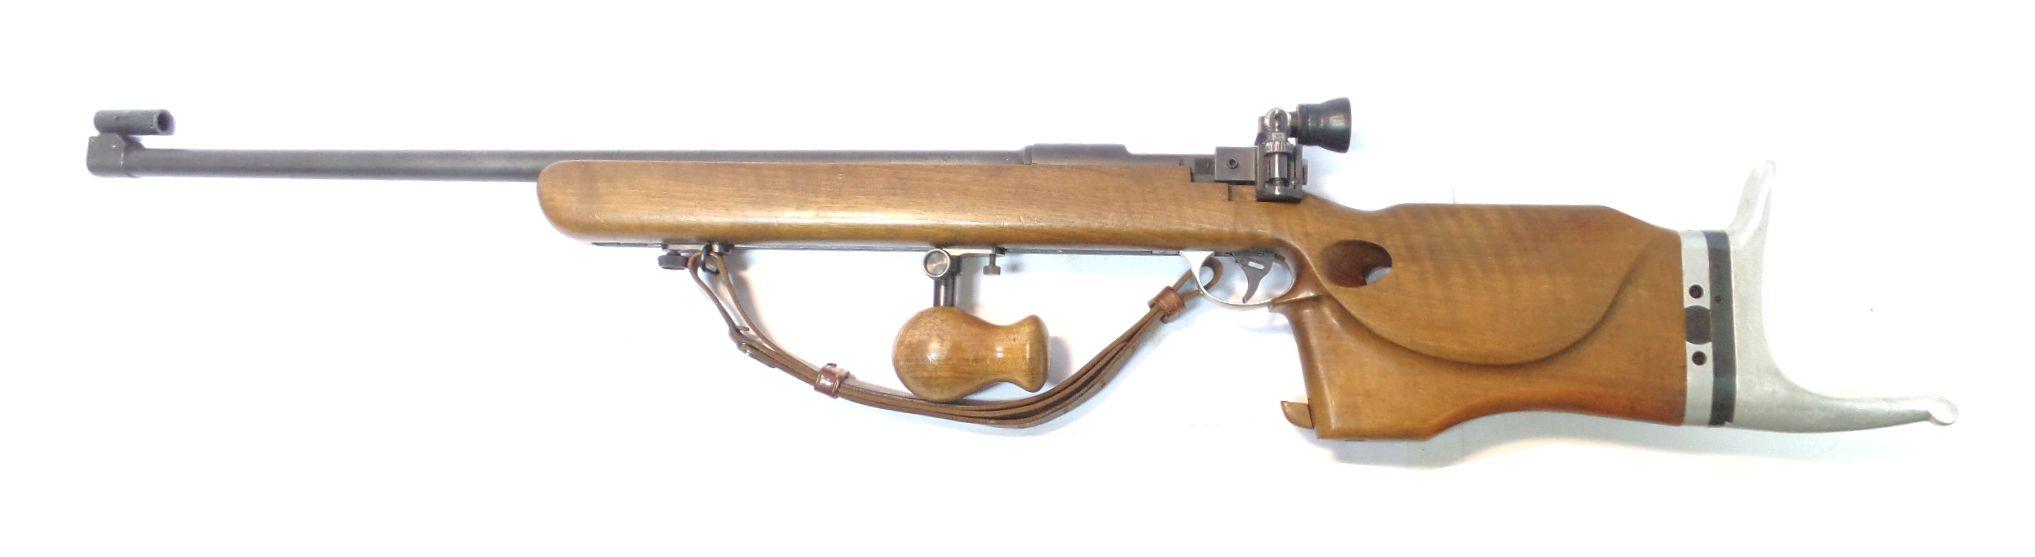 HAMMERLI MATCH calibre 7.5x55